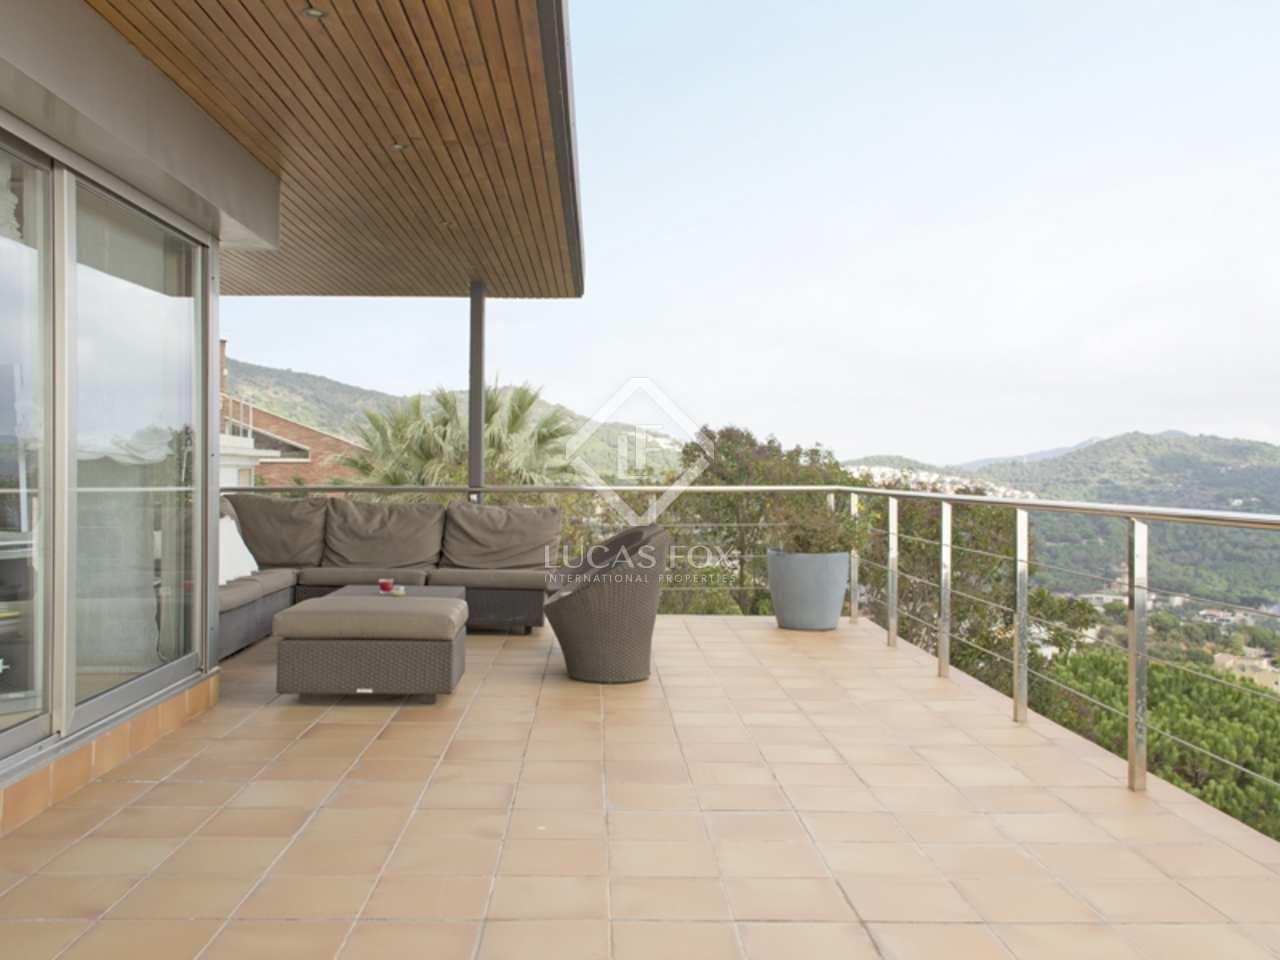 House For Sale On The Maresme Coast Near Barcelona